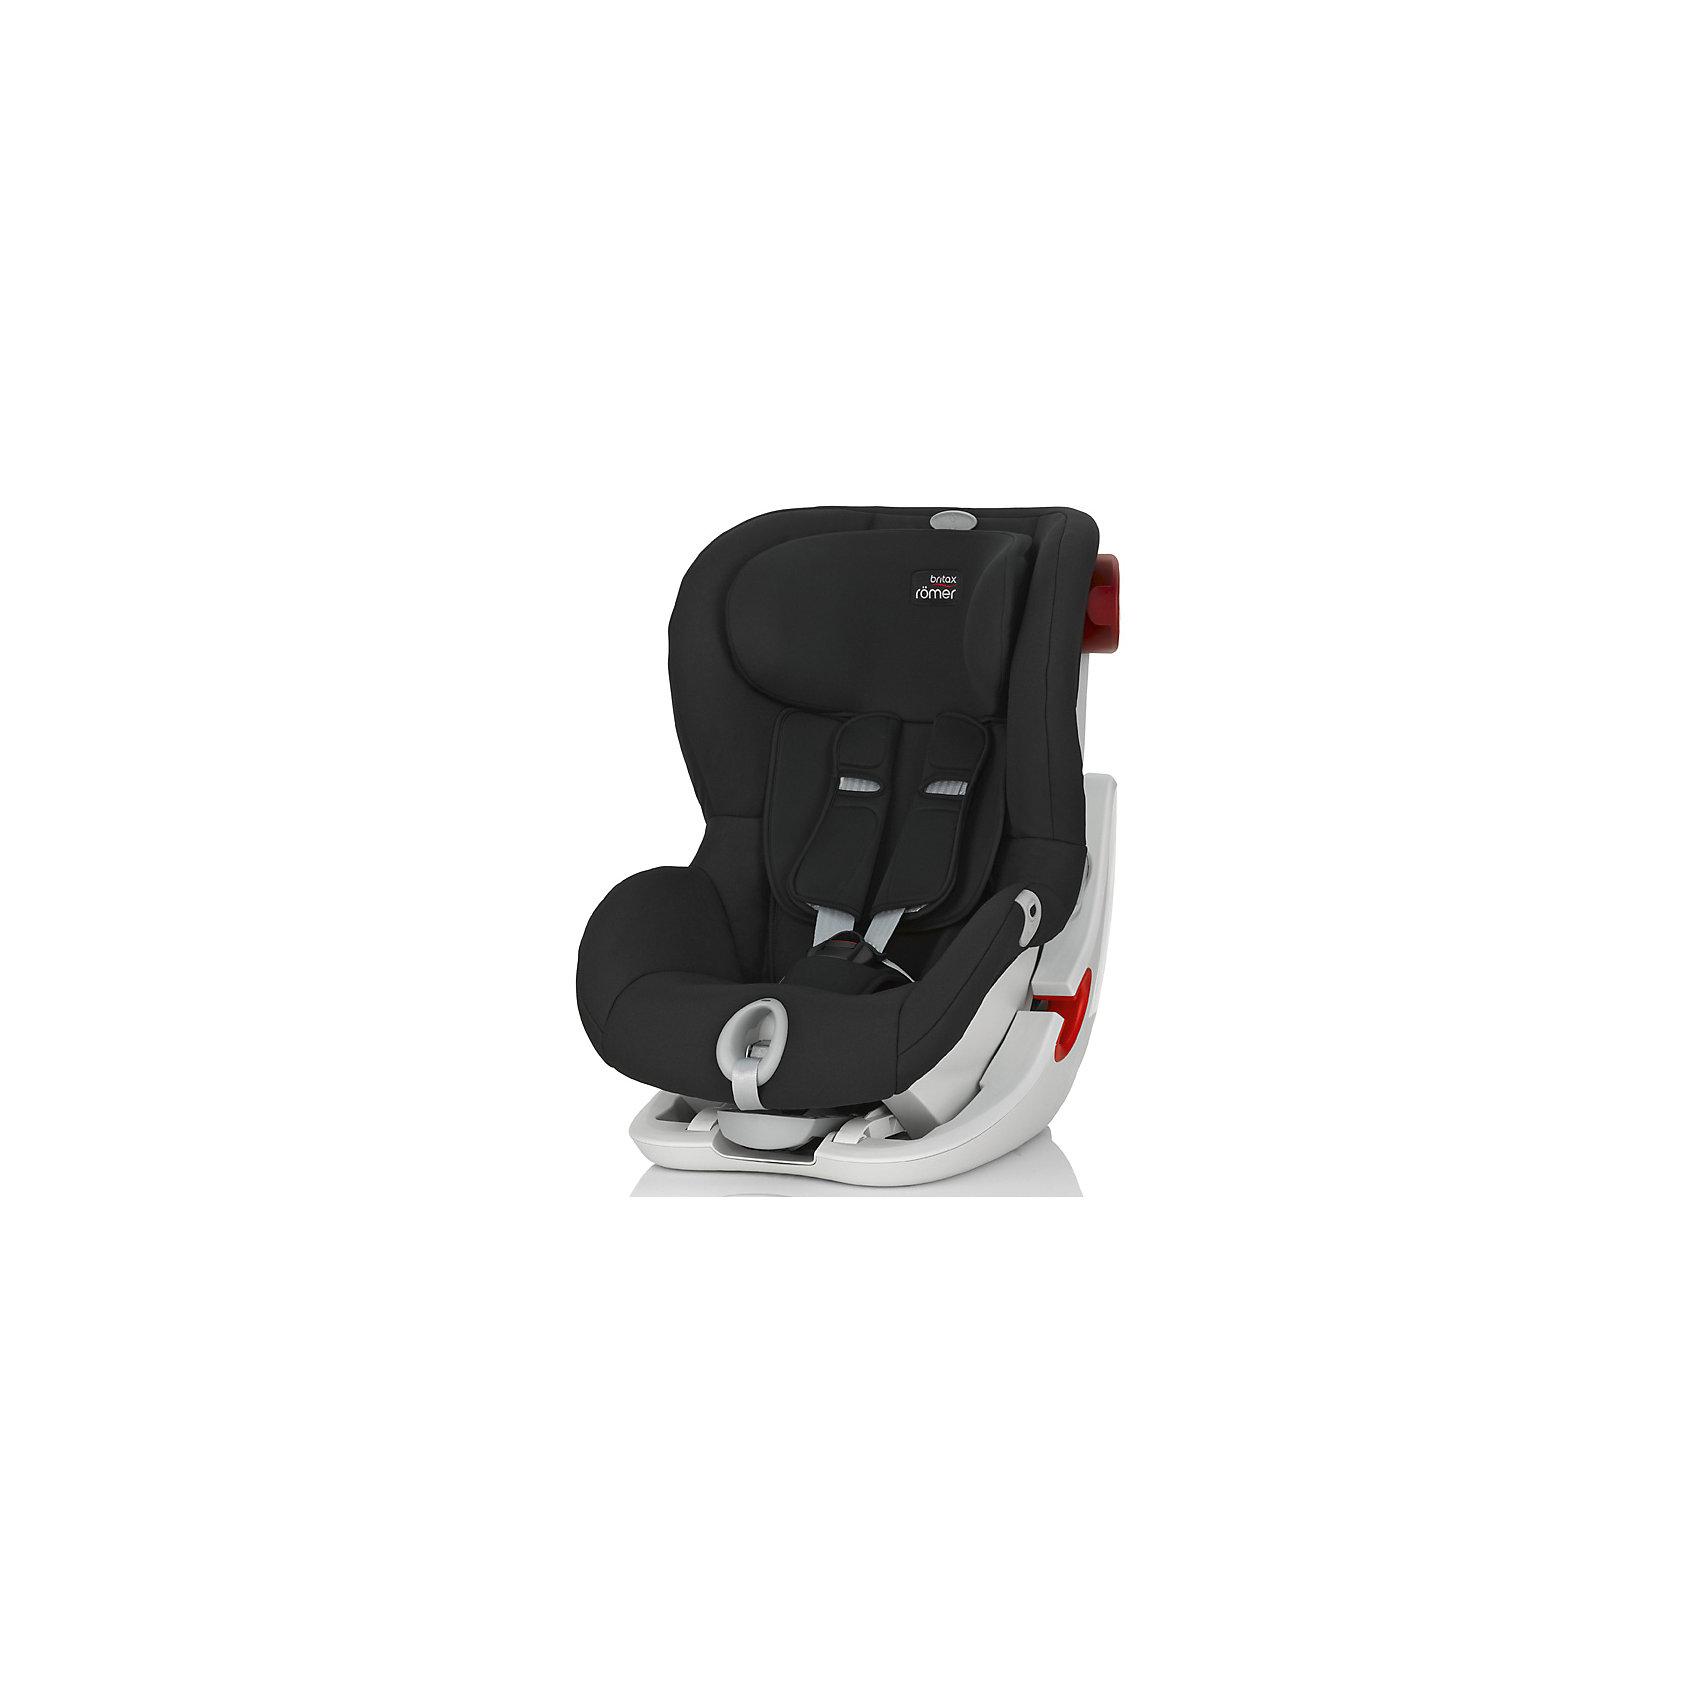 Britax Romer Автокресло Britax Romer KING II LS, 9-18 кг, Cosmos Black Trendline